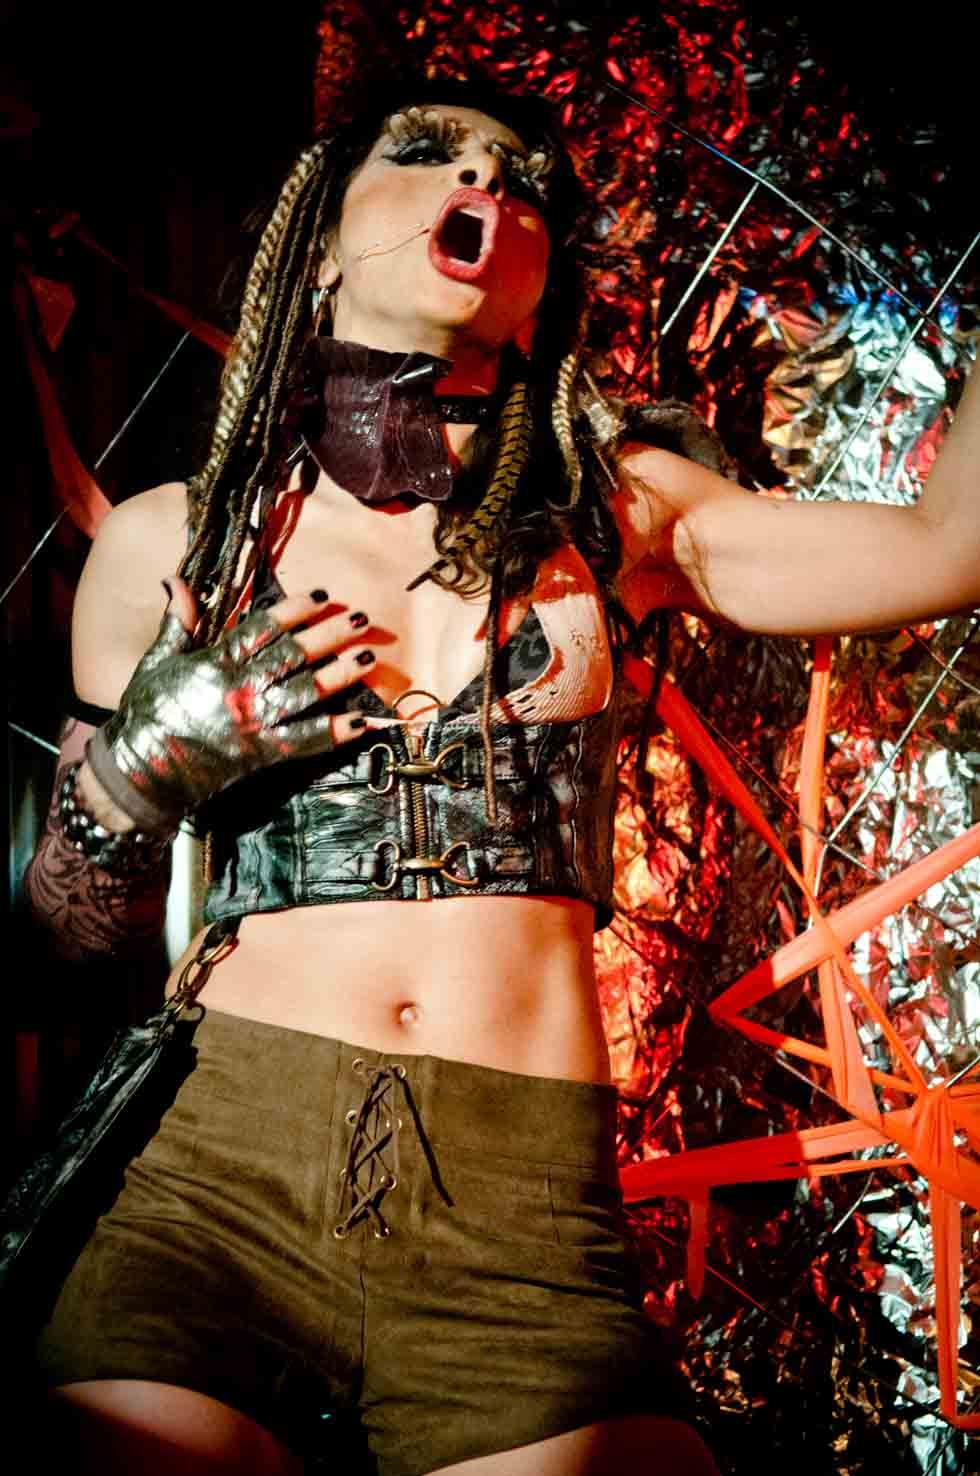 zum-schneider-nyc-2012-karneval-apocalyptika-3395.jpg